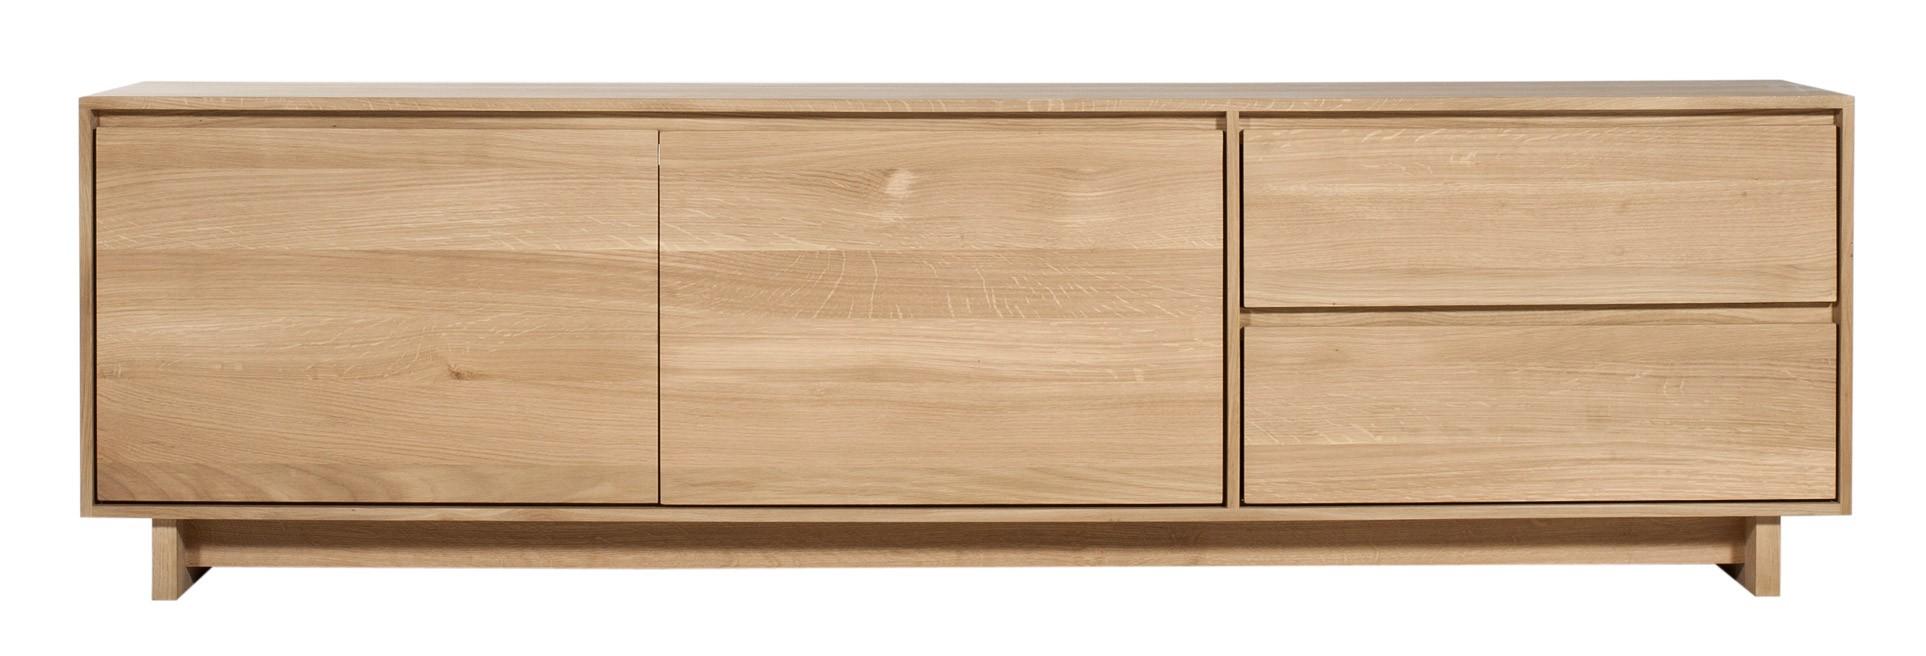 meuble tv wave d ethnicraft 2 portes 1 porte abattante 1 tiroir chene